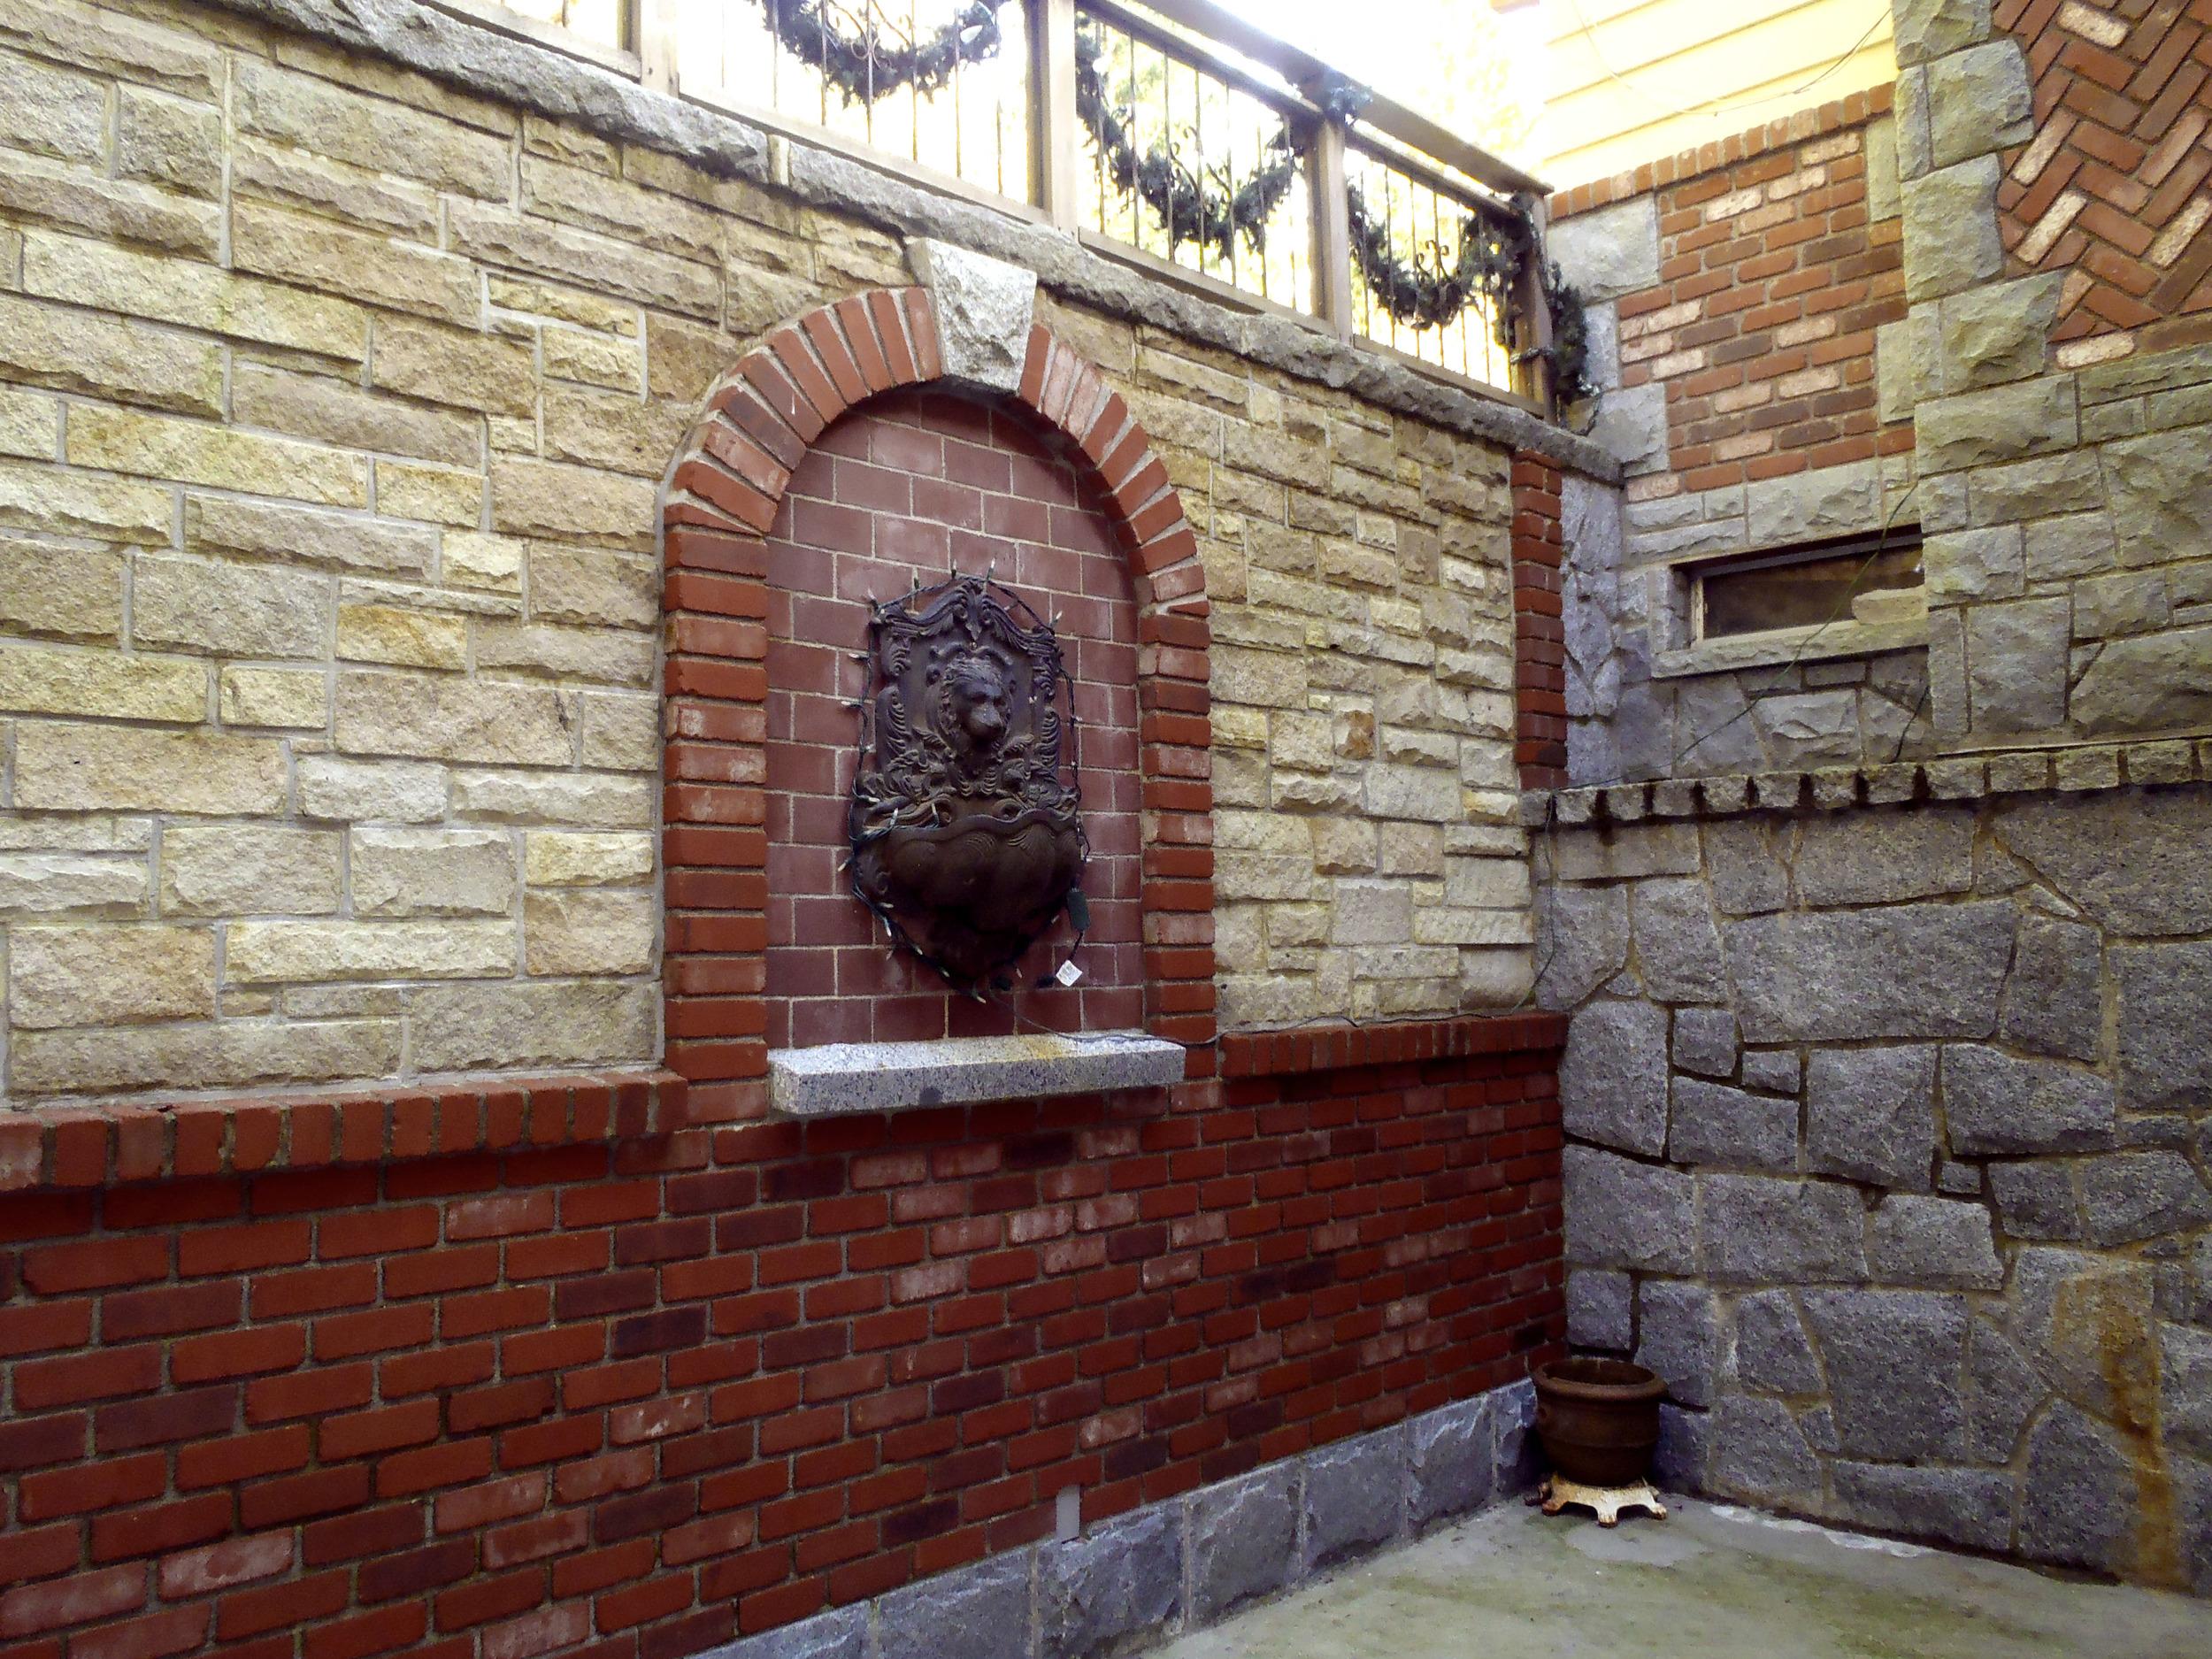 Brick_9.jpg